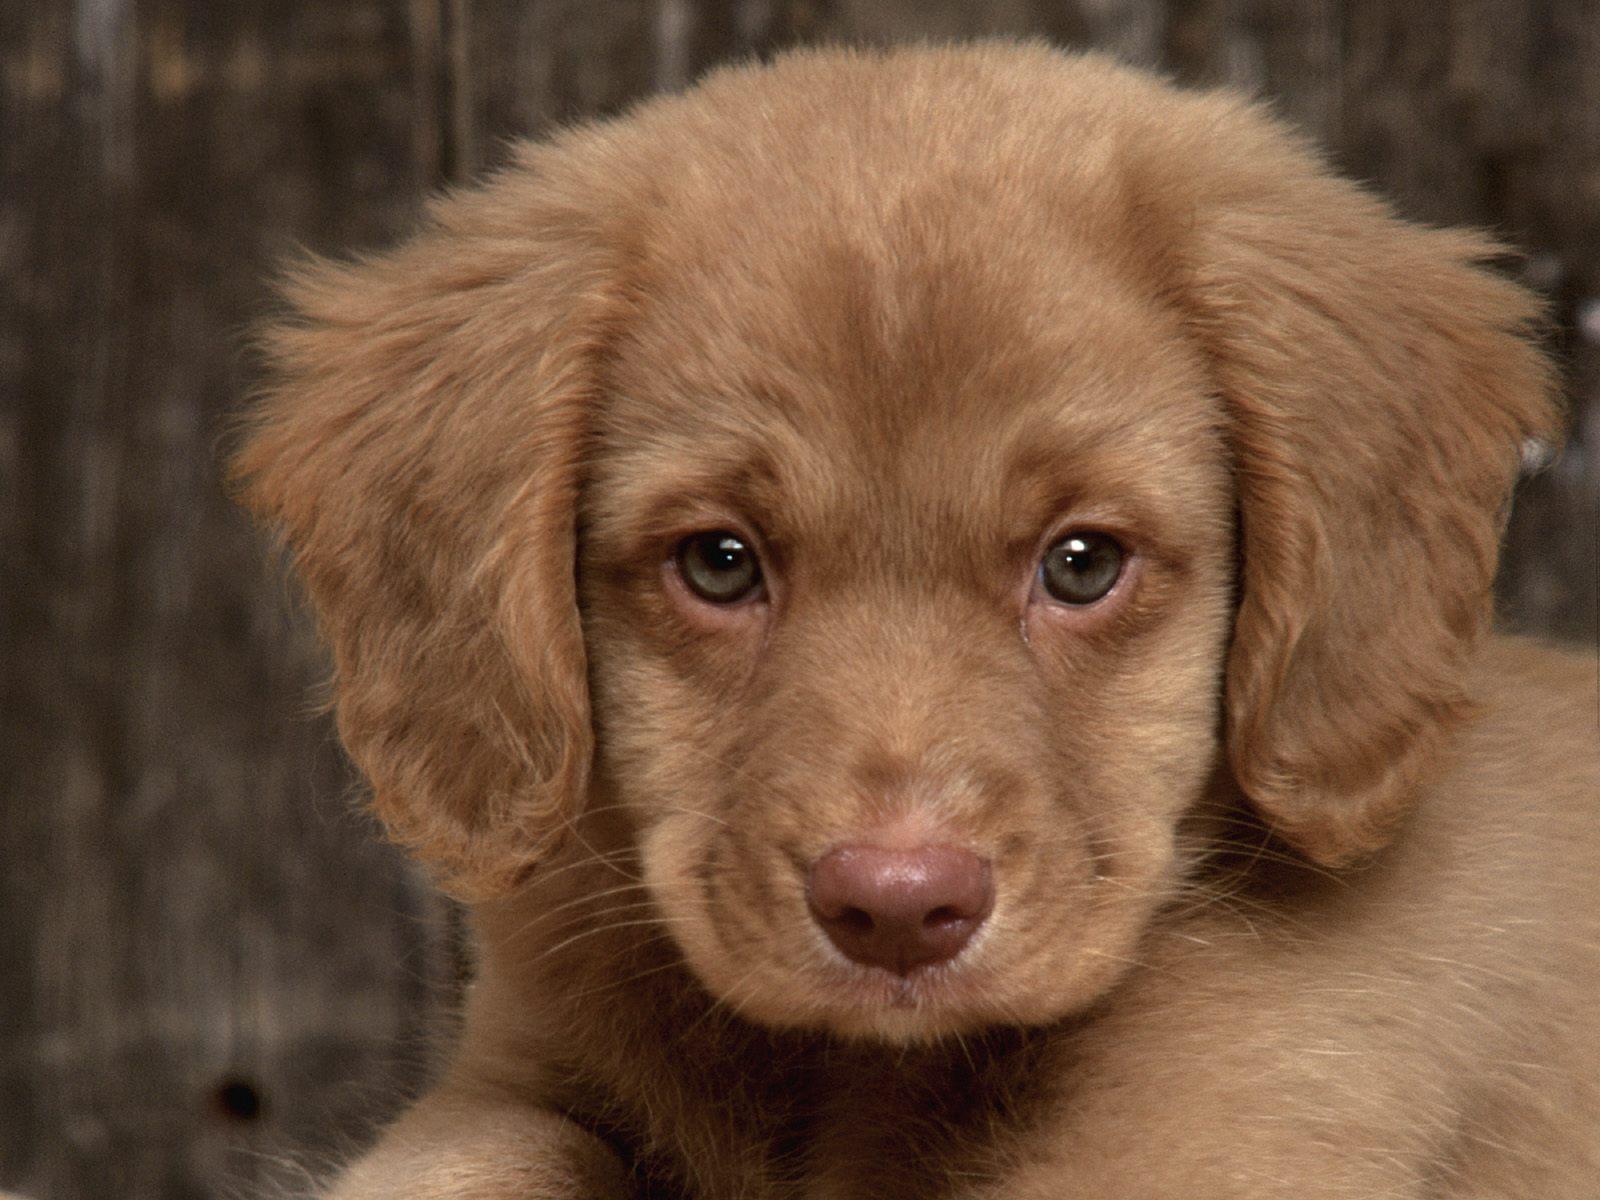 Most Inspiring Puppy Brown Adorable Dog - Buck%252C+Nova+Scotia+Duck+Tolling+Retriever  You Should Have_9410053  .jpg